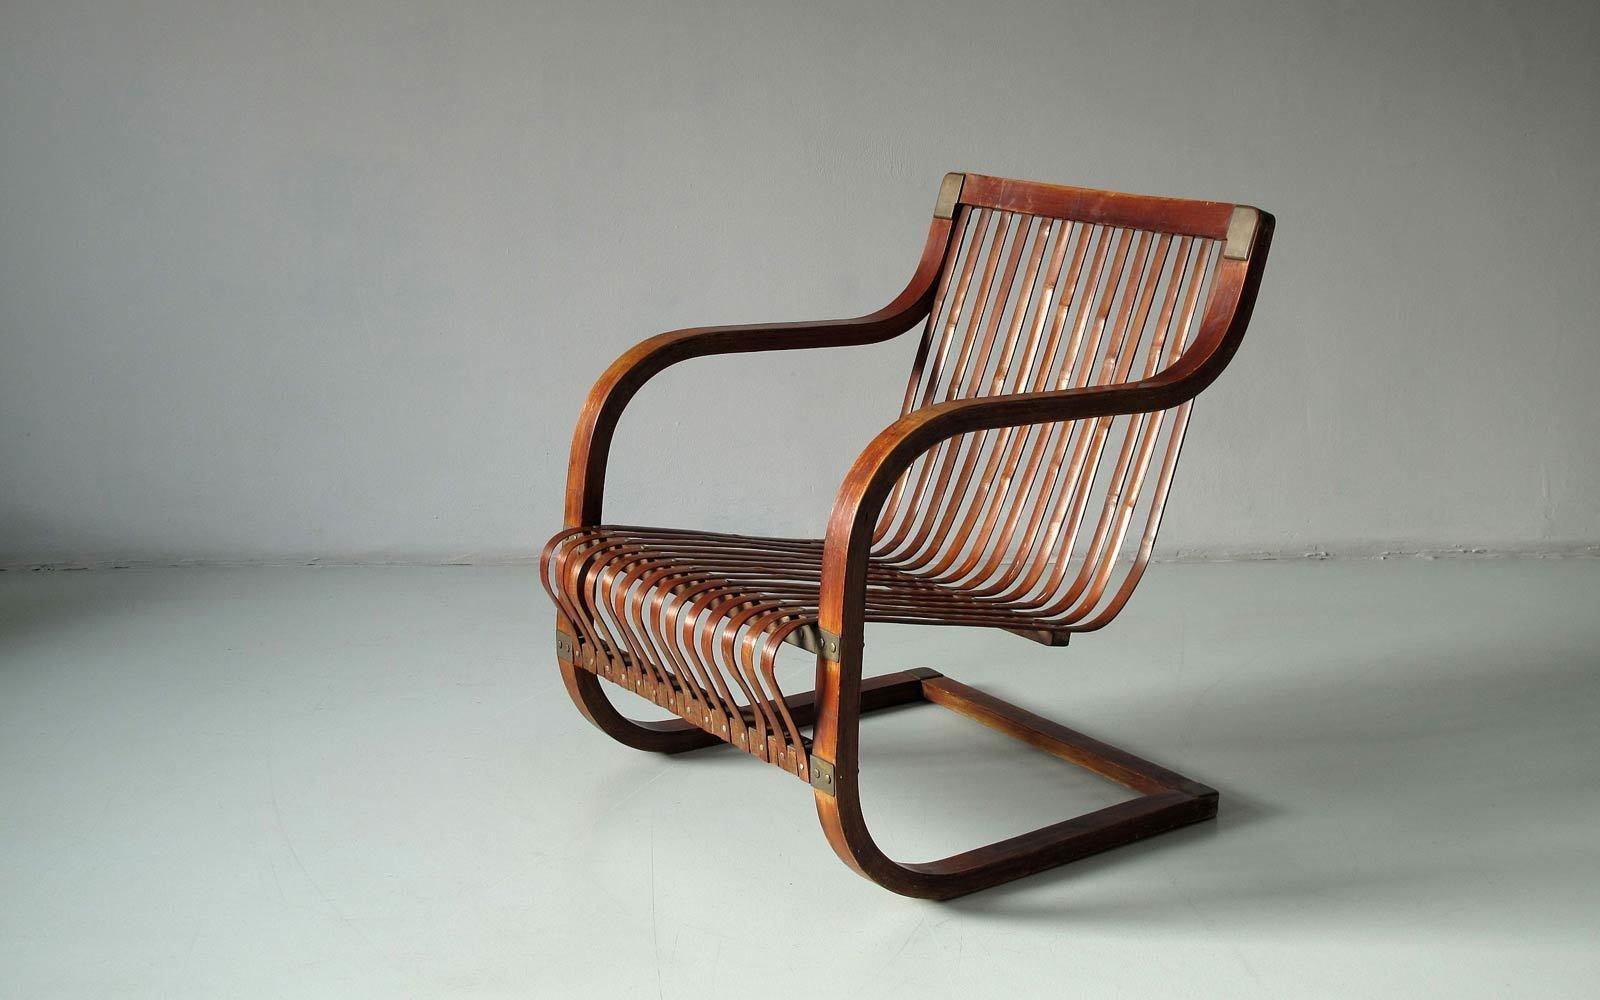 Cantilever chair for Takashimaya Department Store, Tokyo 1940s. Bamboo, oak, bronze.